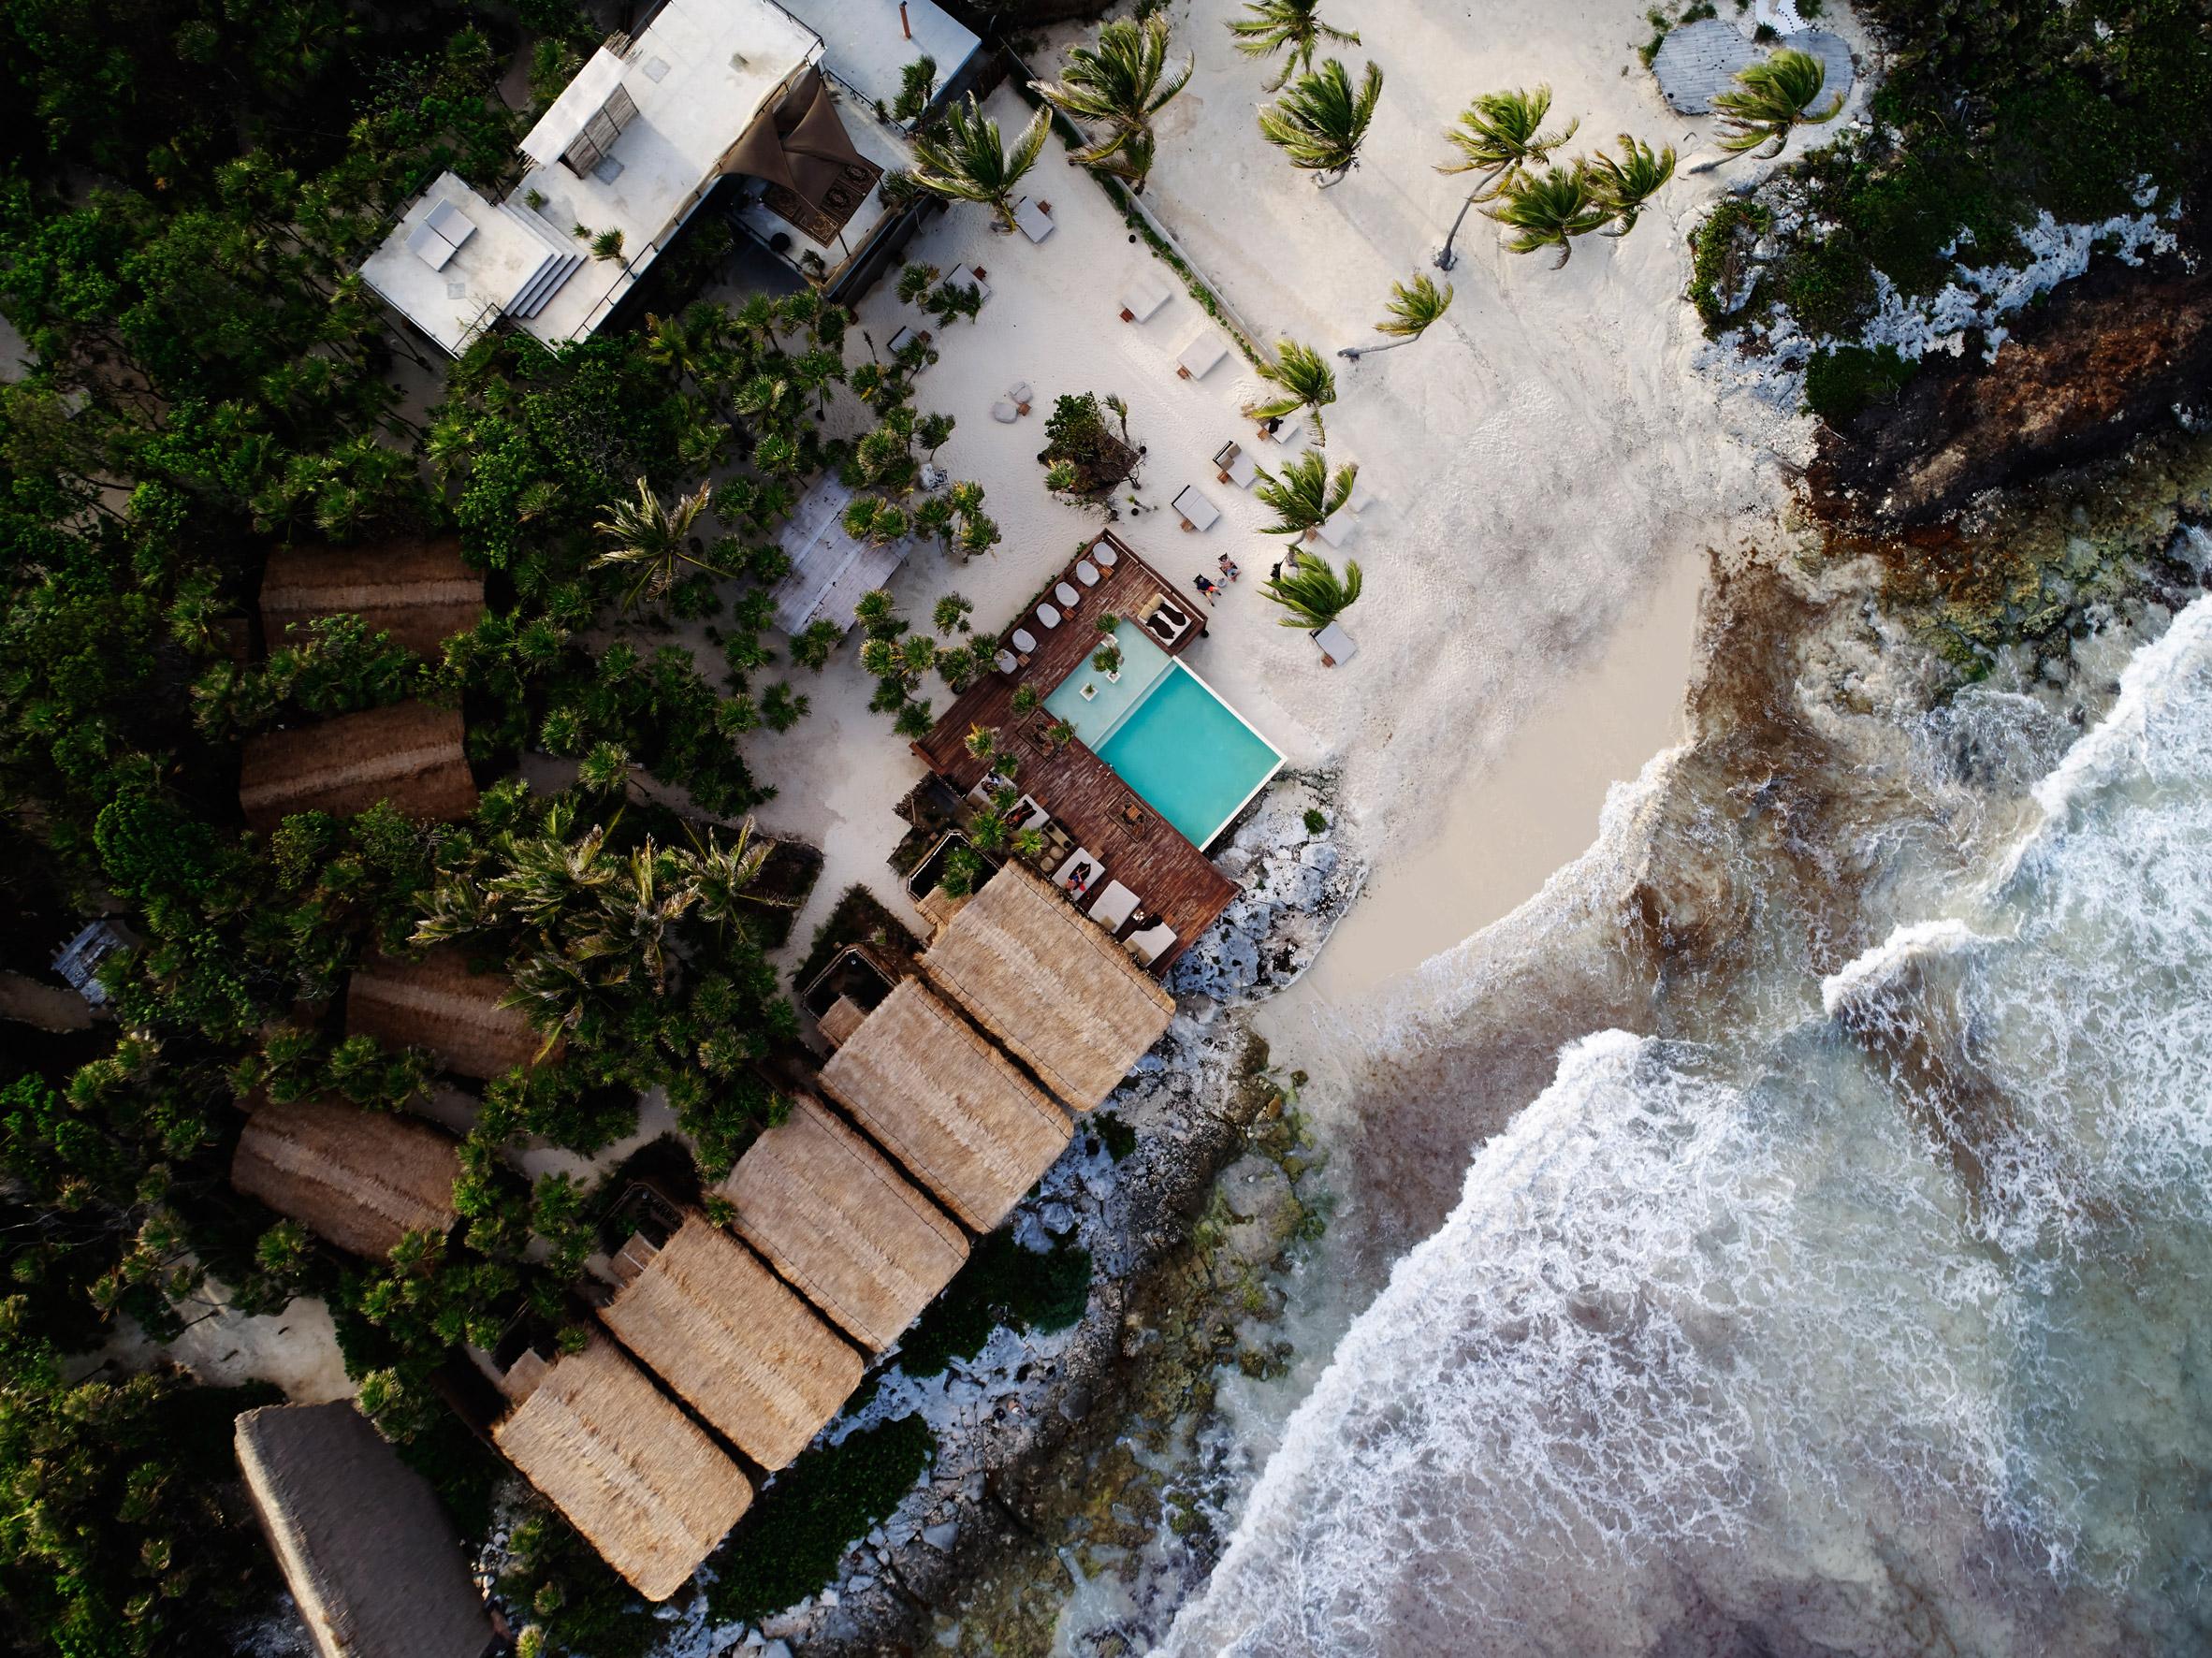 Habitas Tulum boutique hotel offers beachfront and hidden jungle rooms